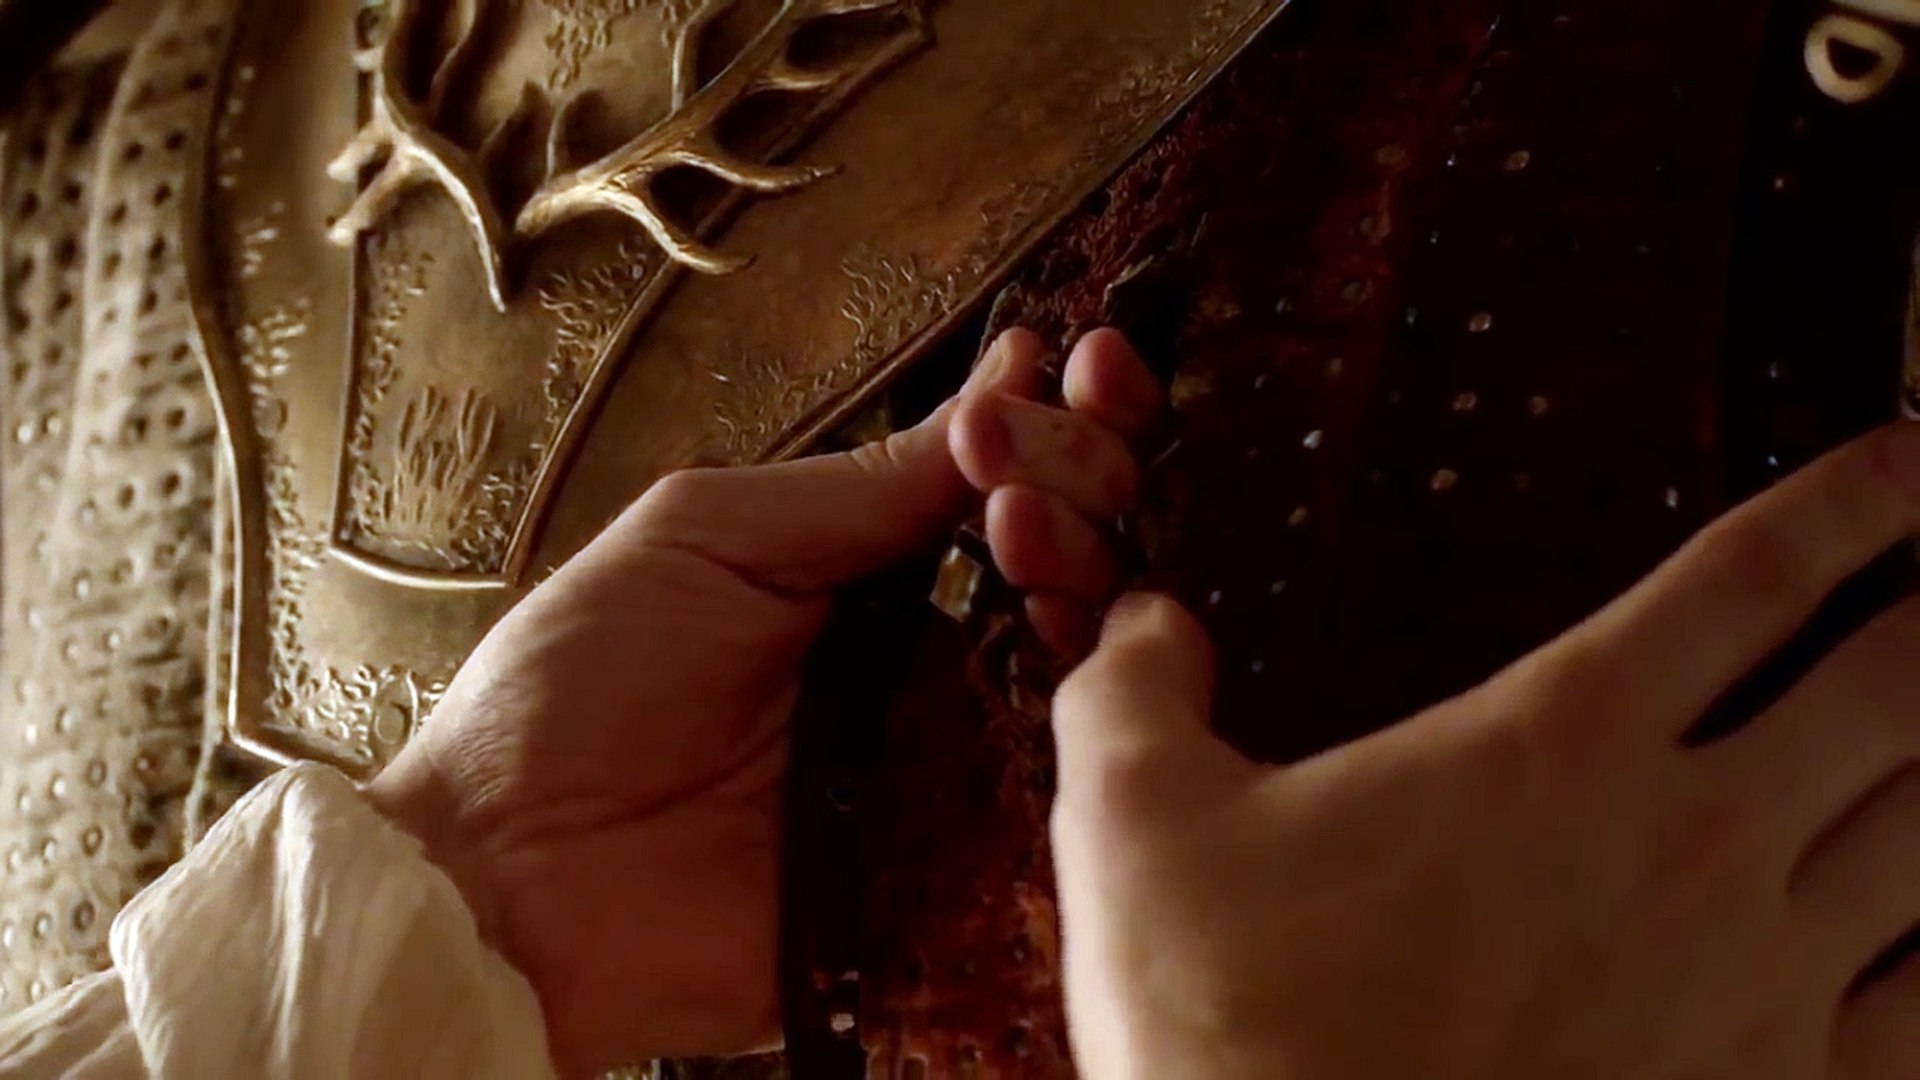 Game of Thrones Season 2 Deleted Scenes